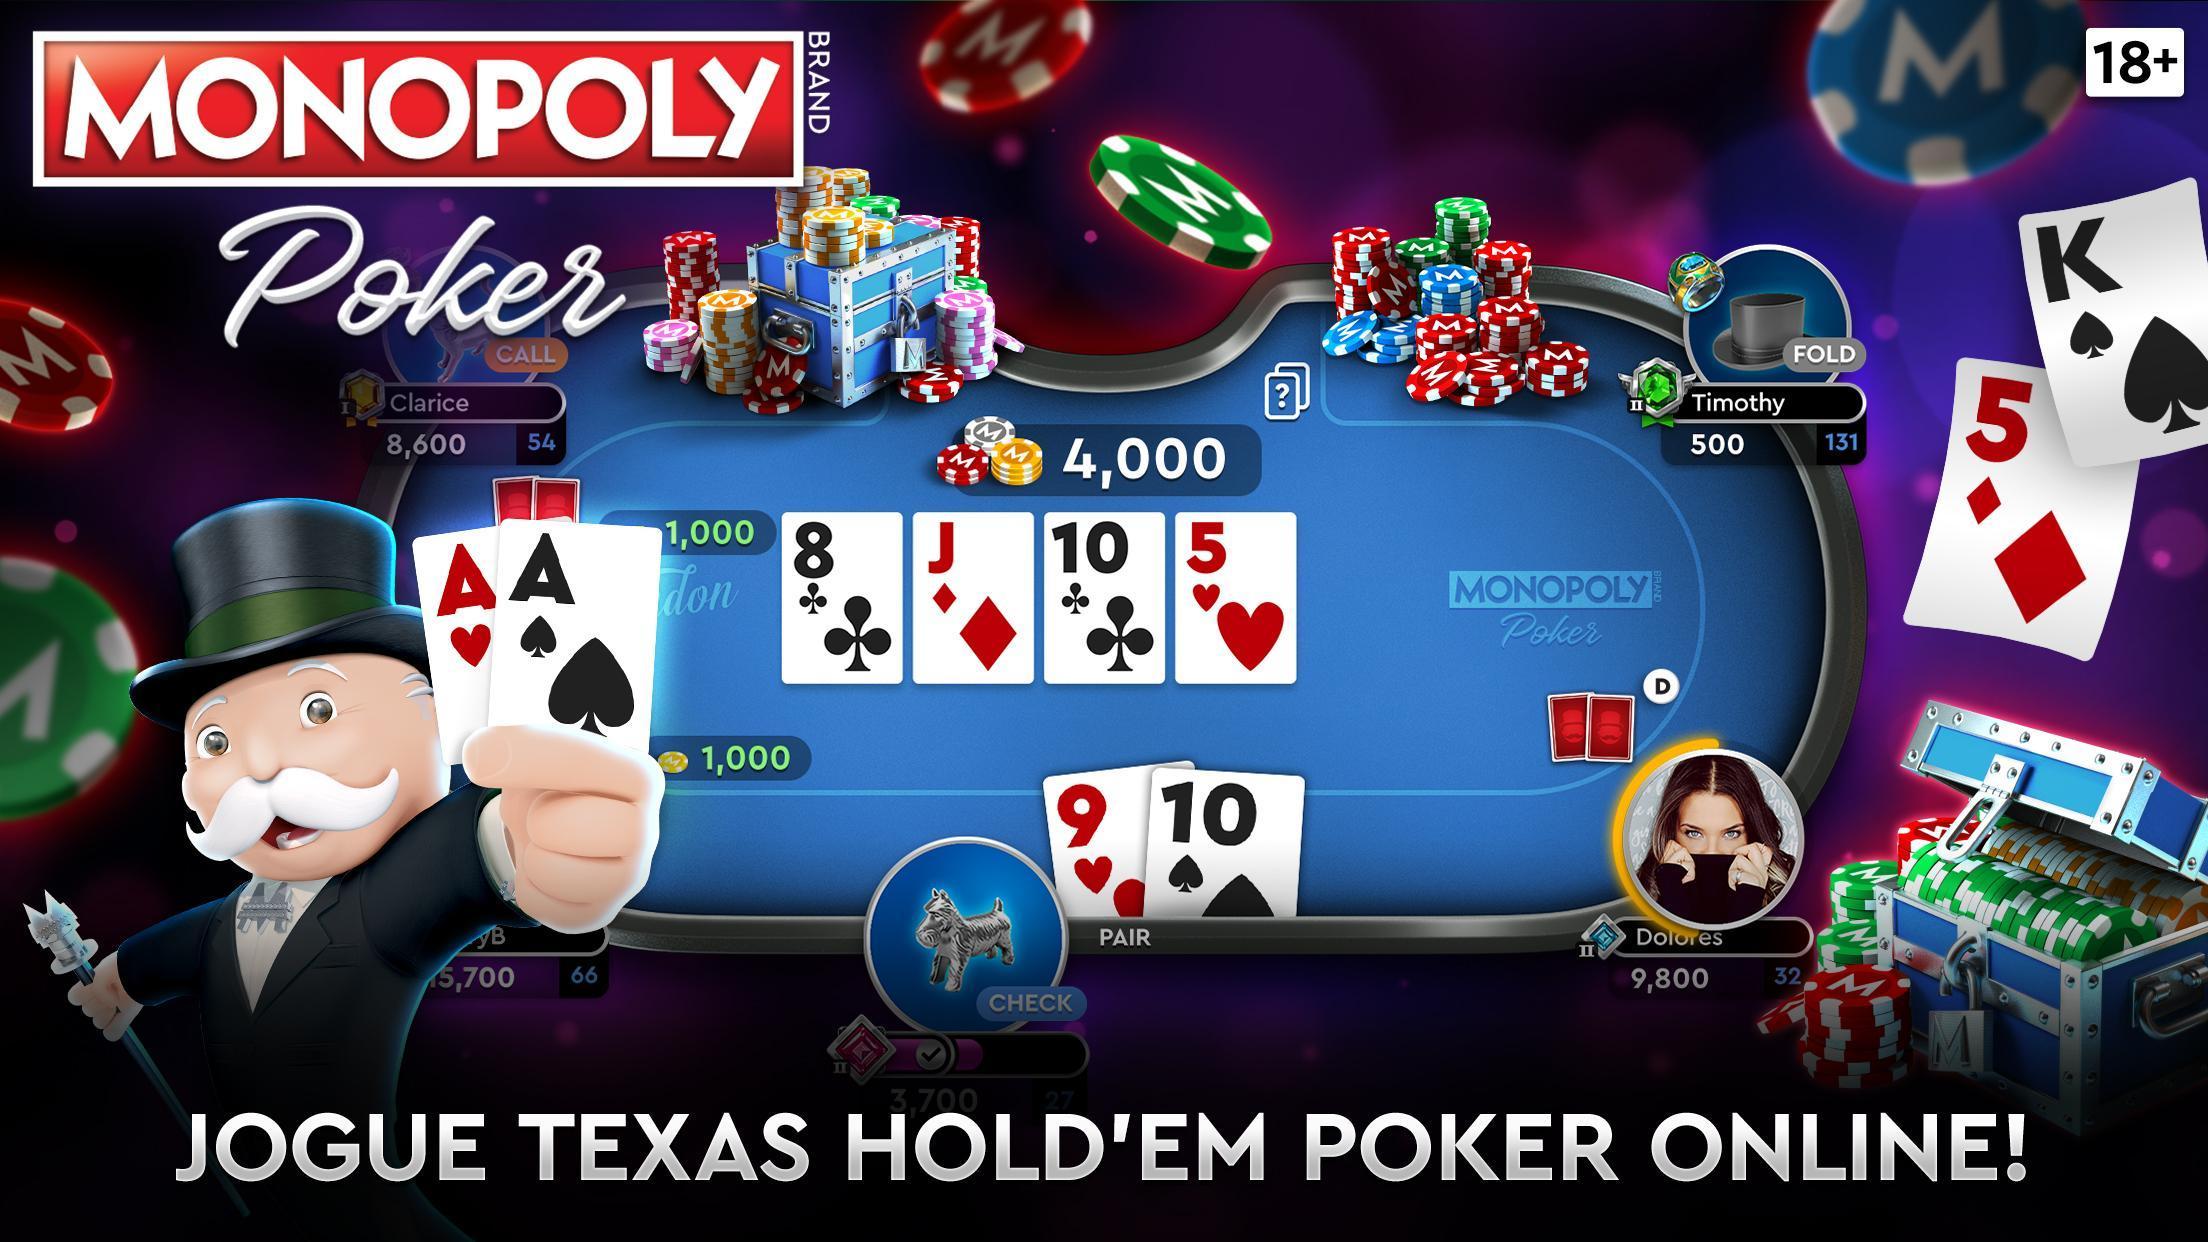 Monopoly Poker para celular